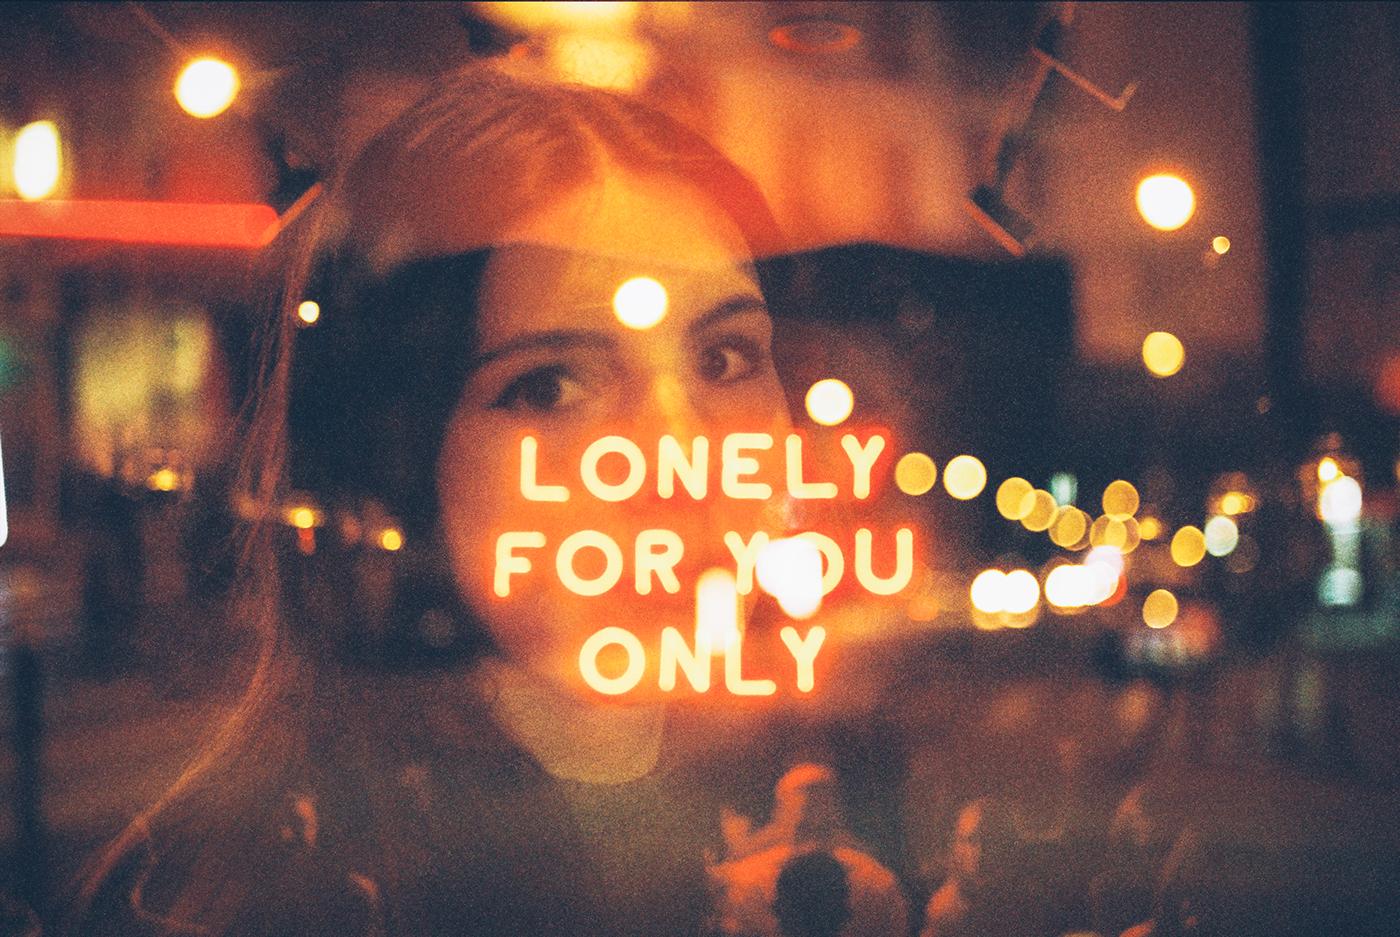 Film  ,analog,double exposures,neon,signs,dark,mood